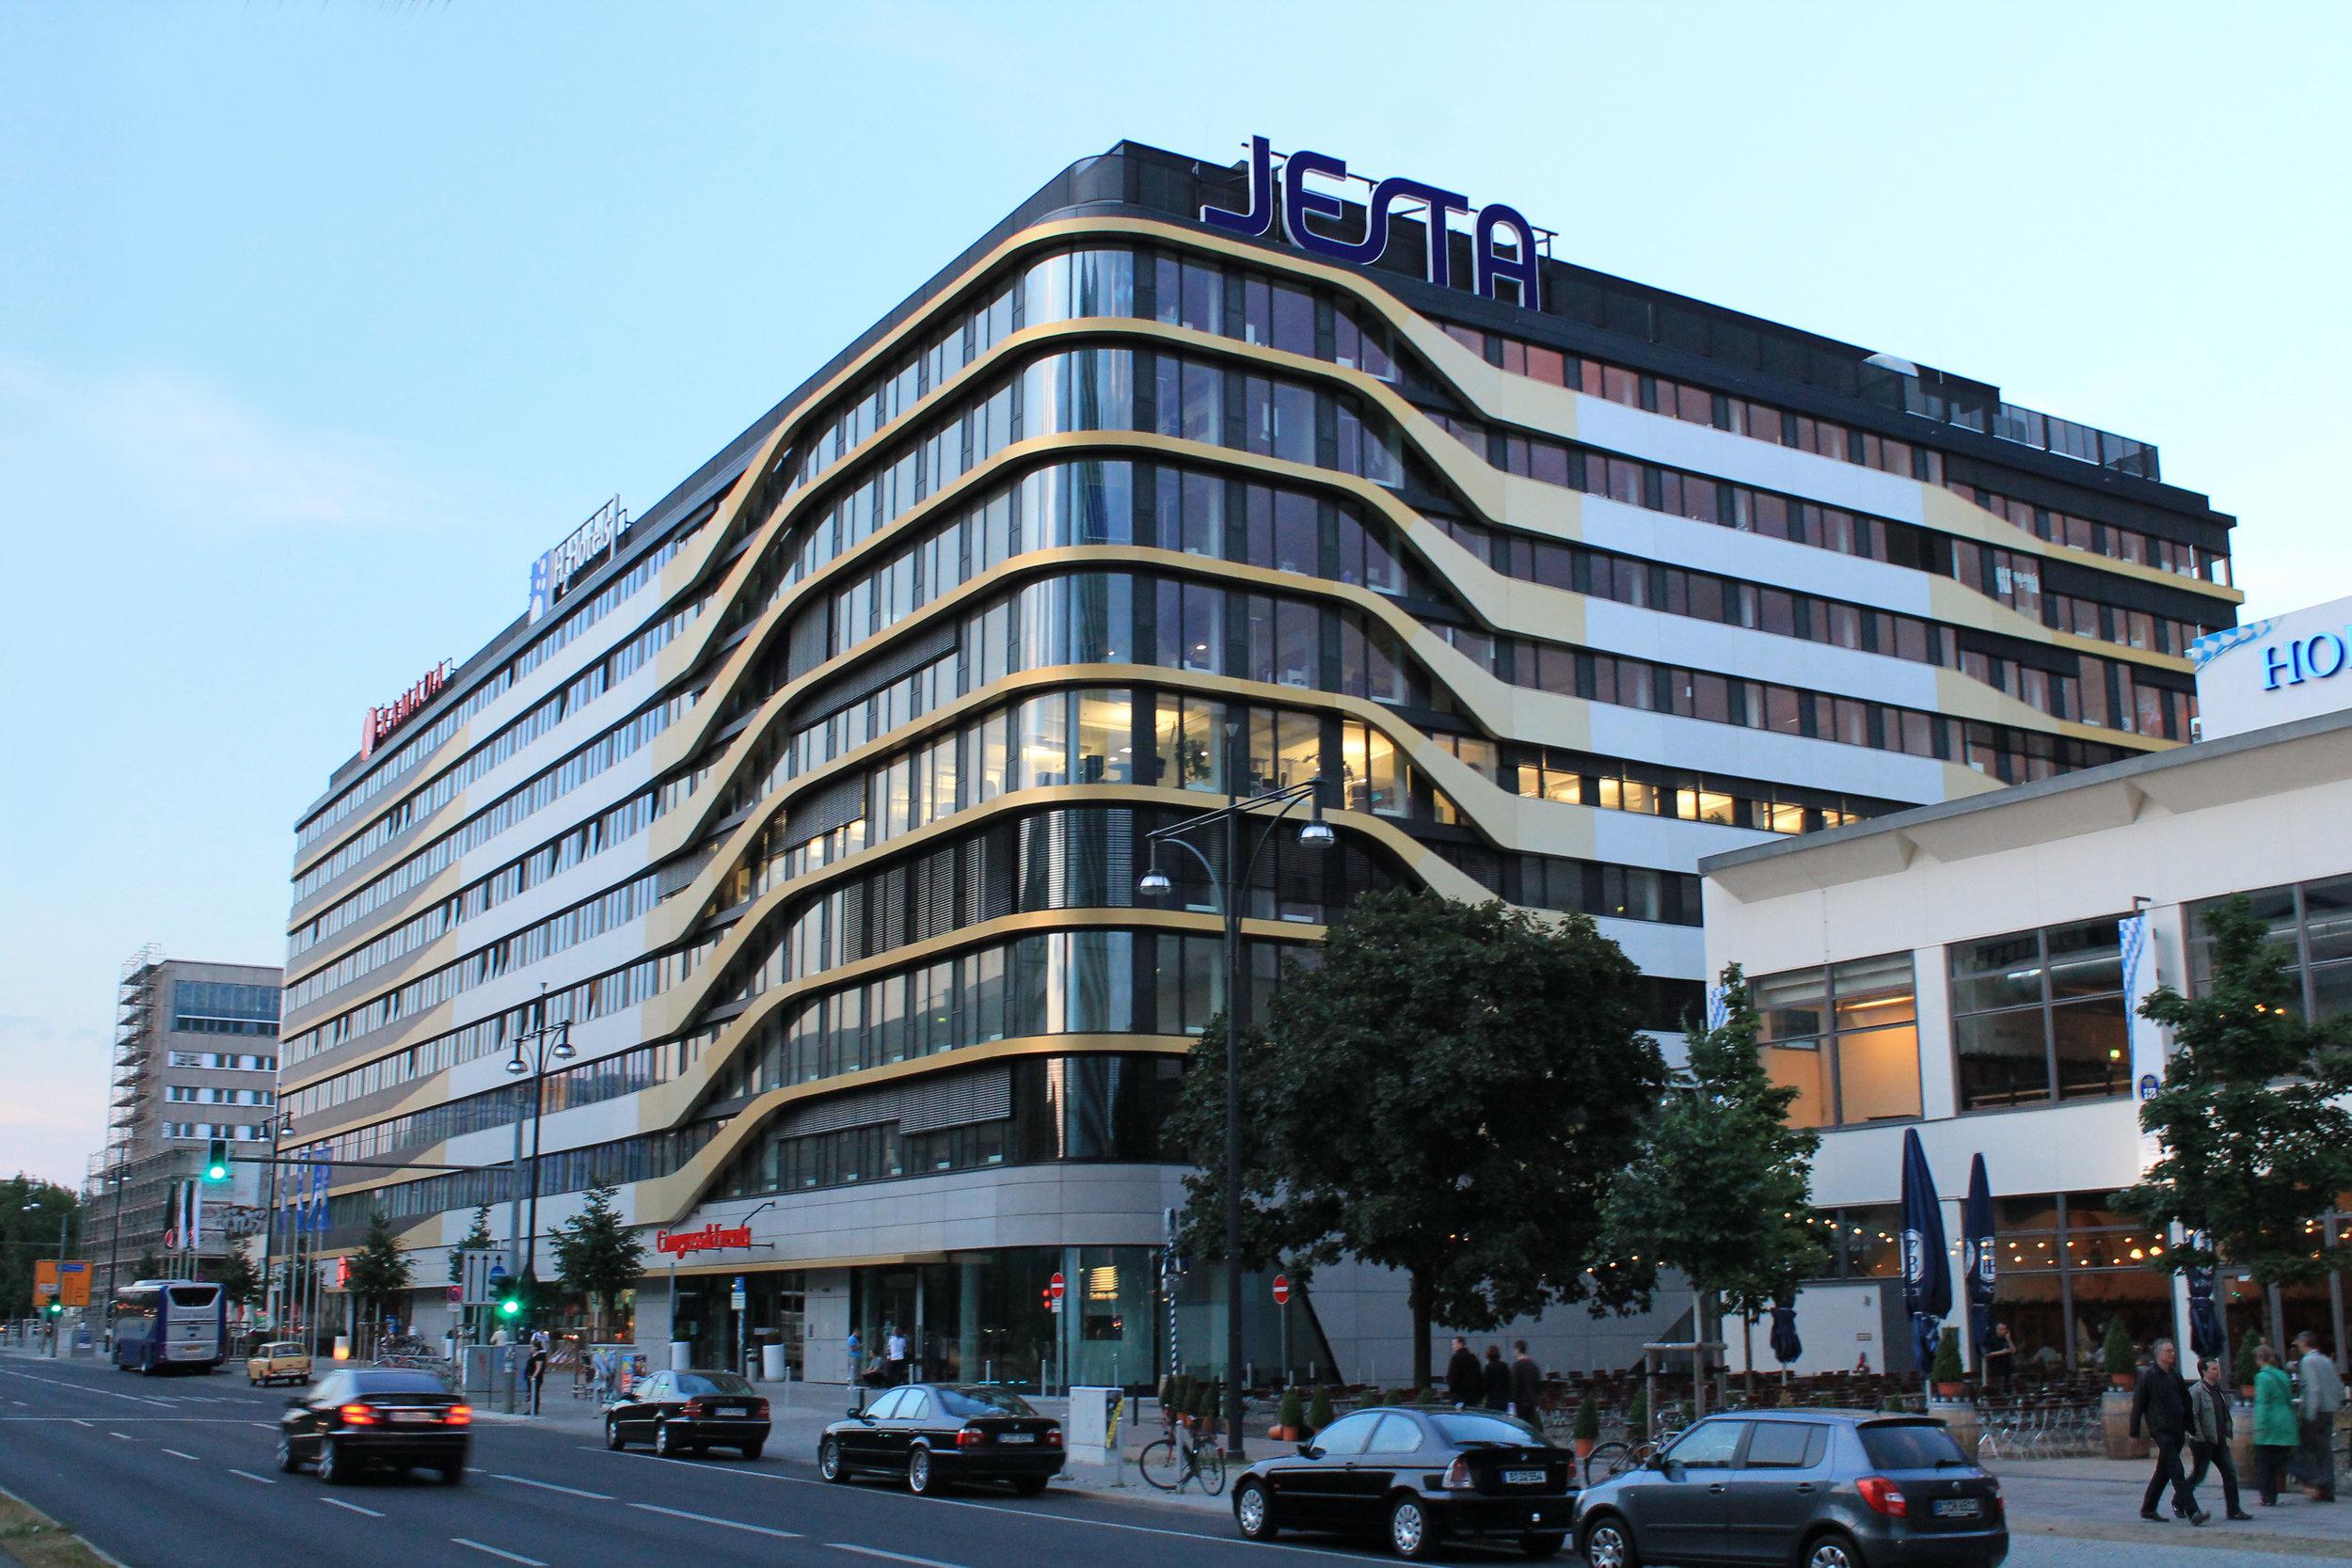 RAMADA Congresshotel, Berlin /Nalbach + Nalbach Architekten mbH, Berlin